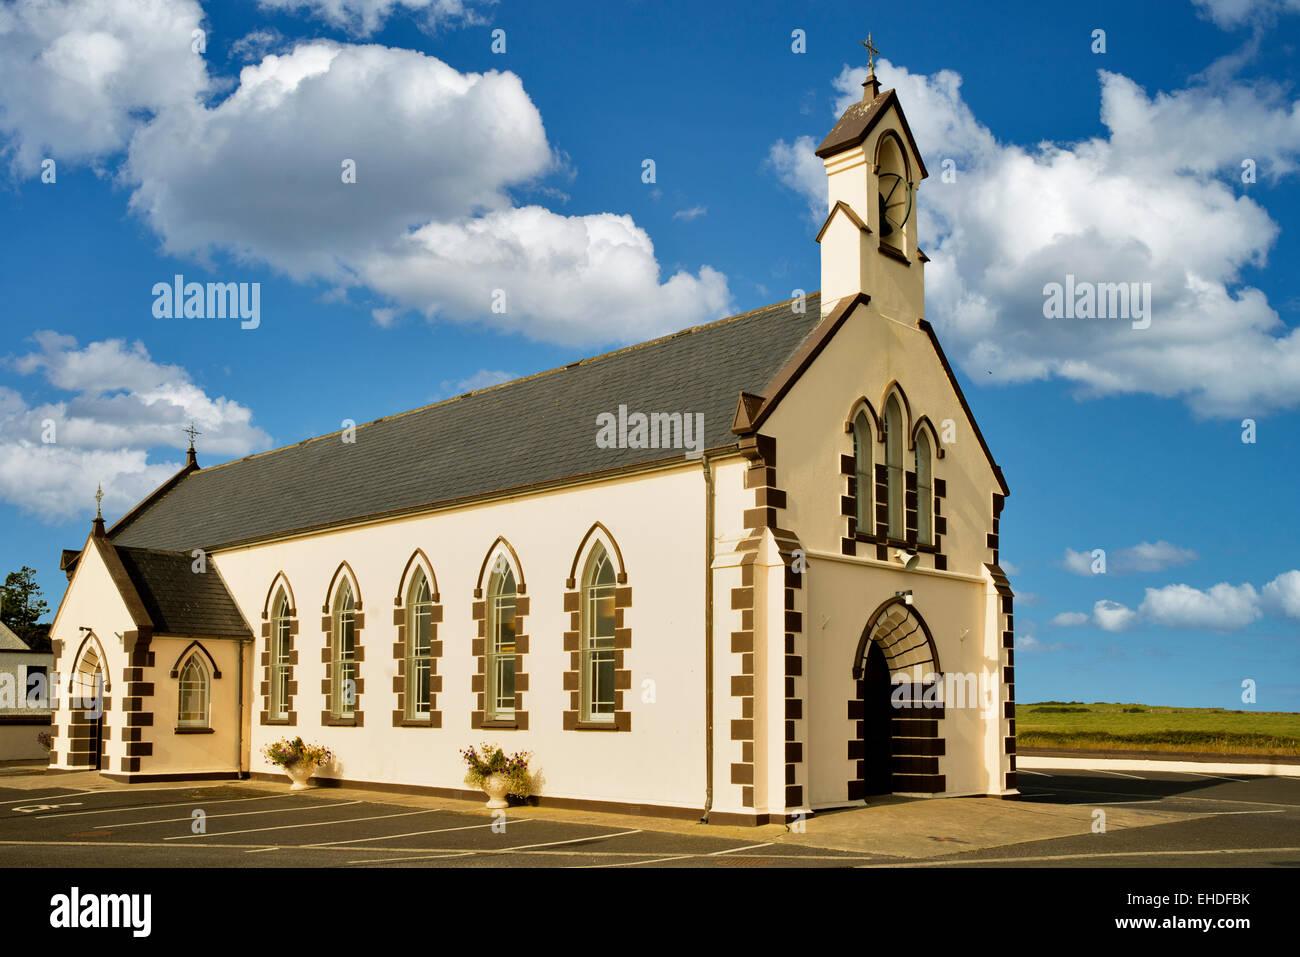 Rathlee Church. Rathlee, Ireland - Stock Image